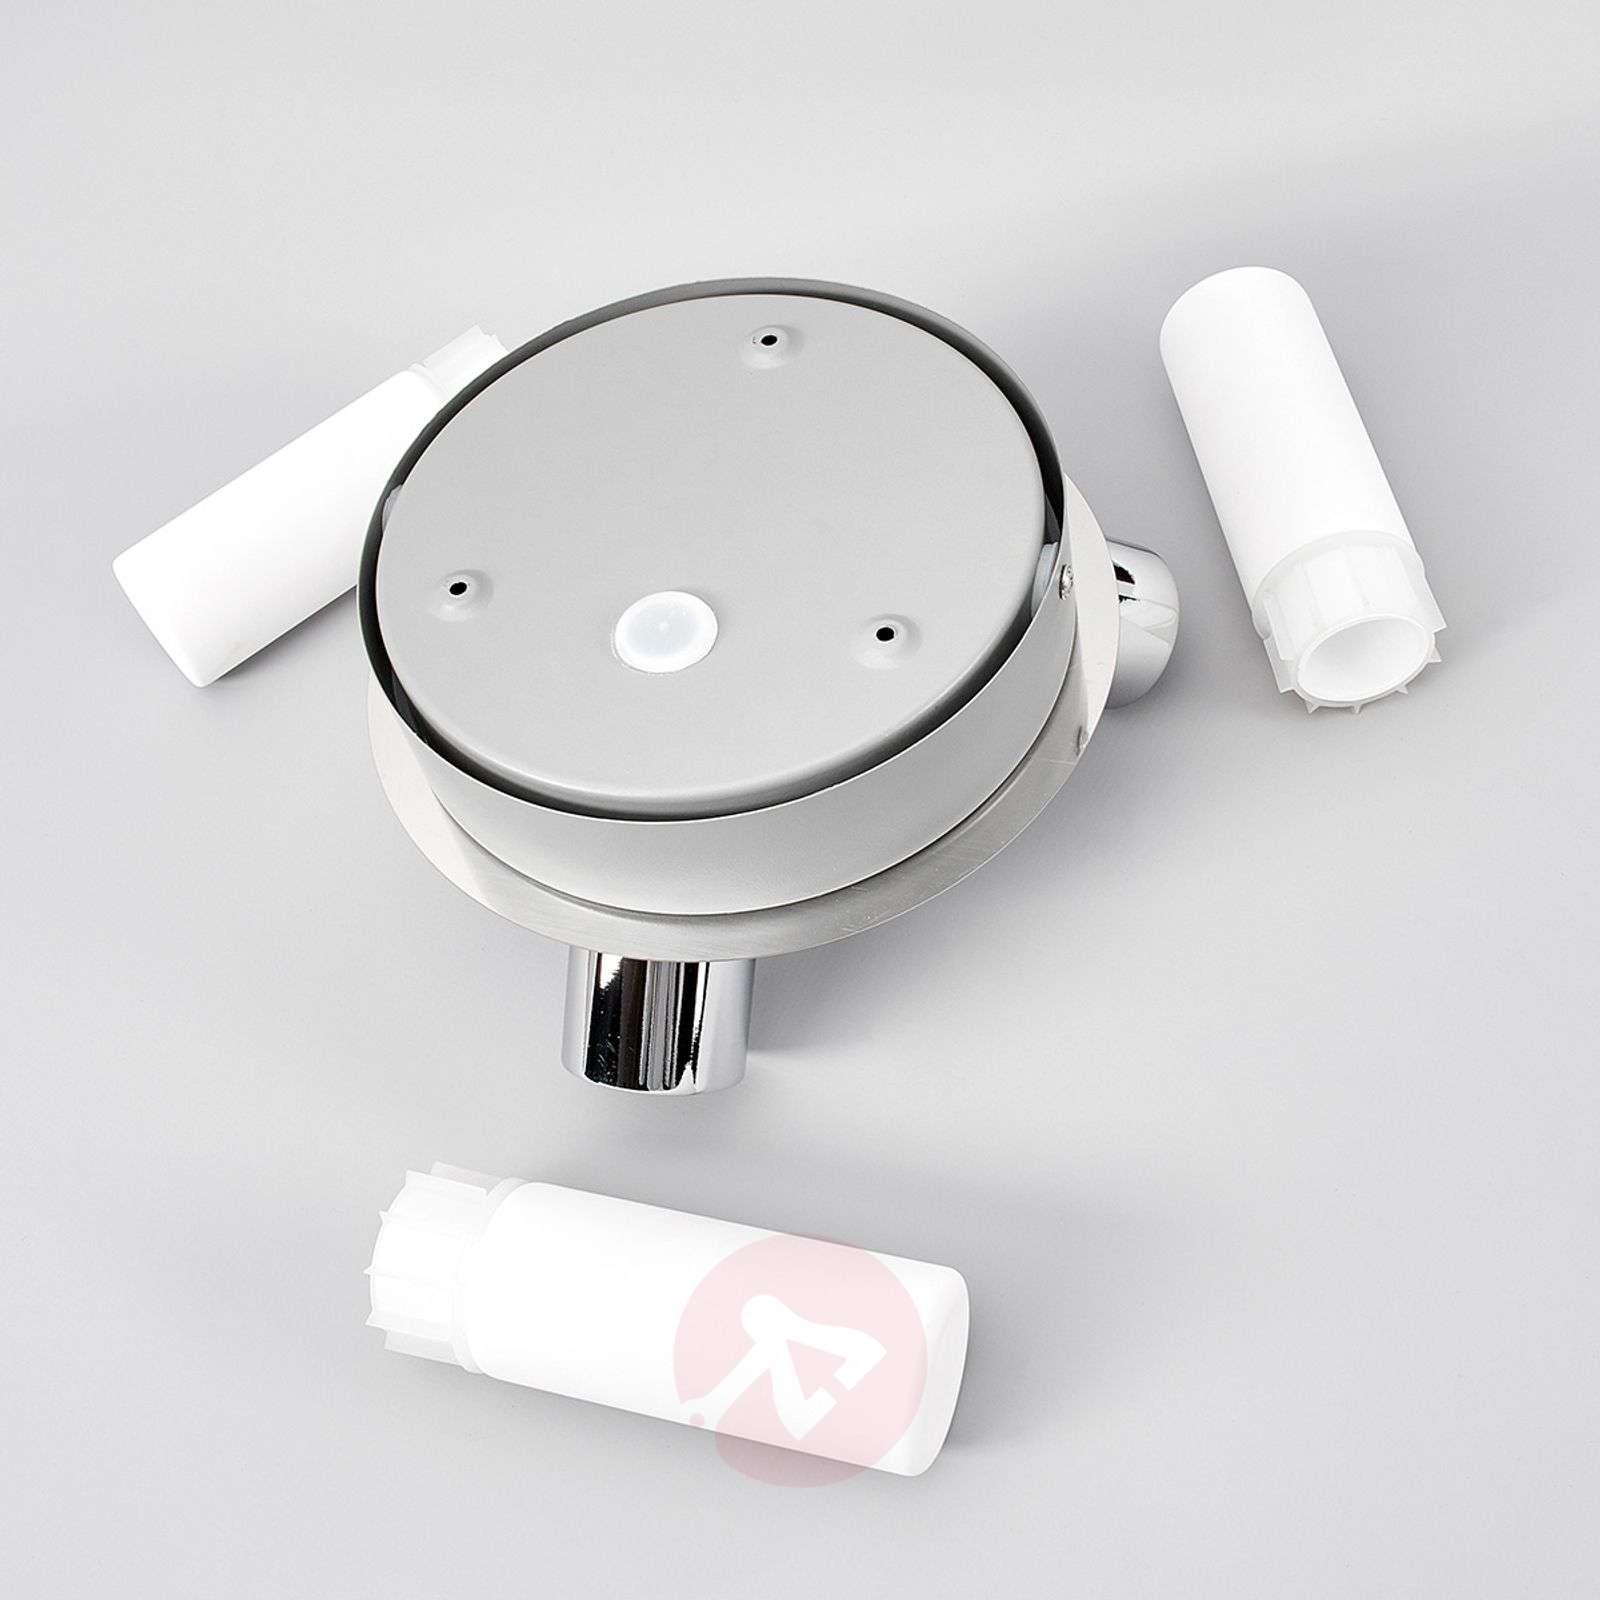 3-light Benaja LED bathroom ceiling lamp-9994004-01